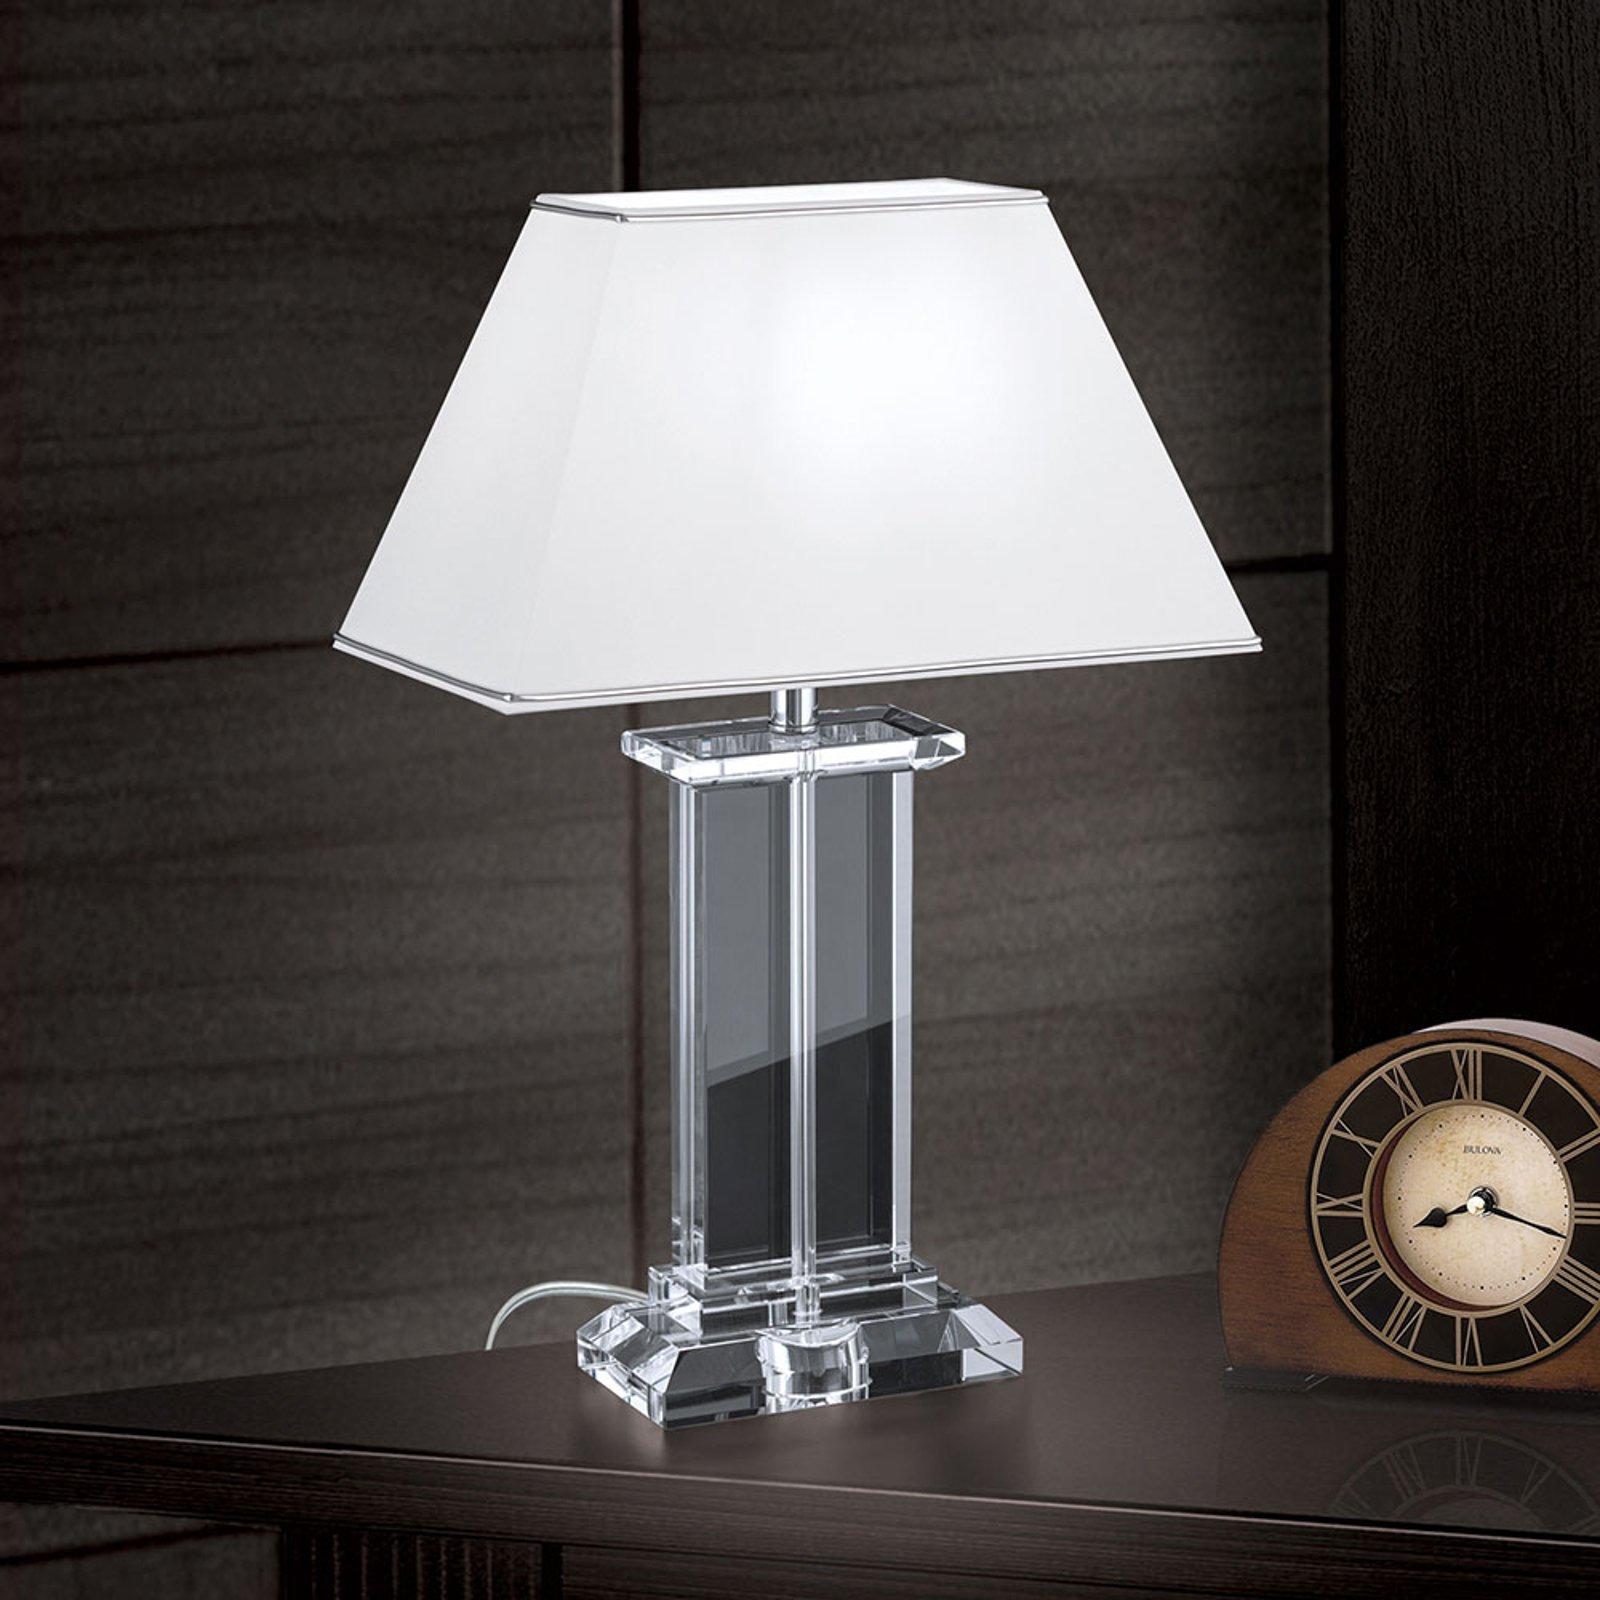 Bordlampe Veronique, fot bred, hvit/krom